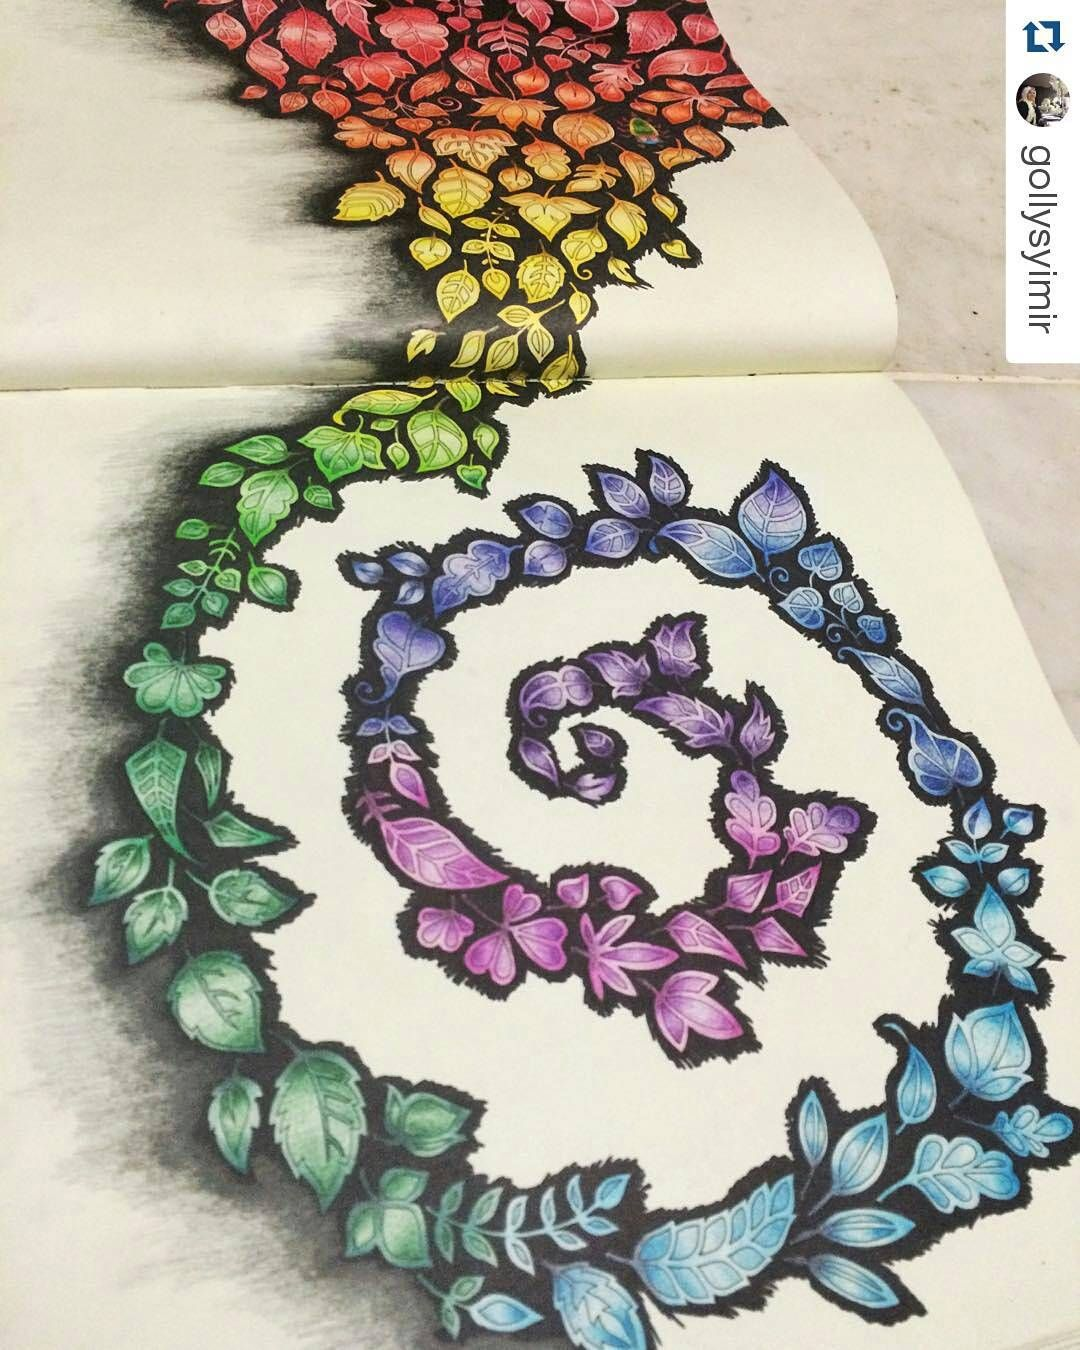 Adorei o degrade de cores!!!!! #Repost @gollysyimir with @repostapp  #rainbow #enchantedforest #enchantedforestcoloringbook #johannabasford #coloring #secretgarden #jardimsecreto #florestaencantada #artecomoterapia #coloriage #colorir #instaart #instacoloring #coloring #livrodecolorir #amocolorir